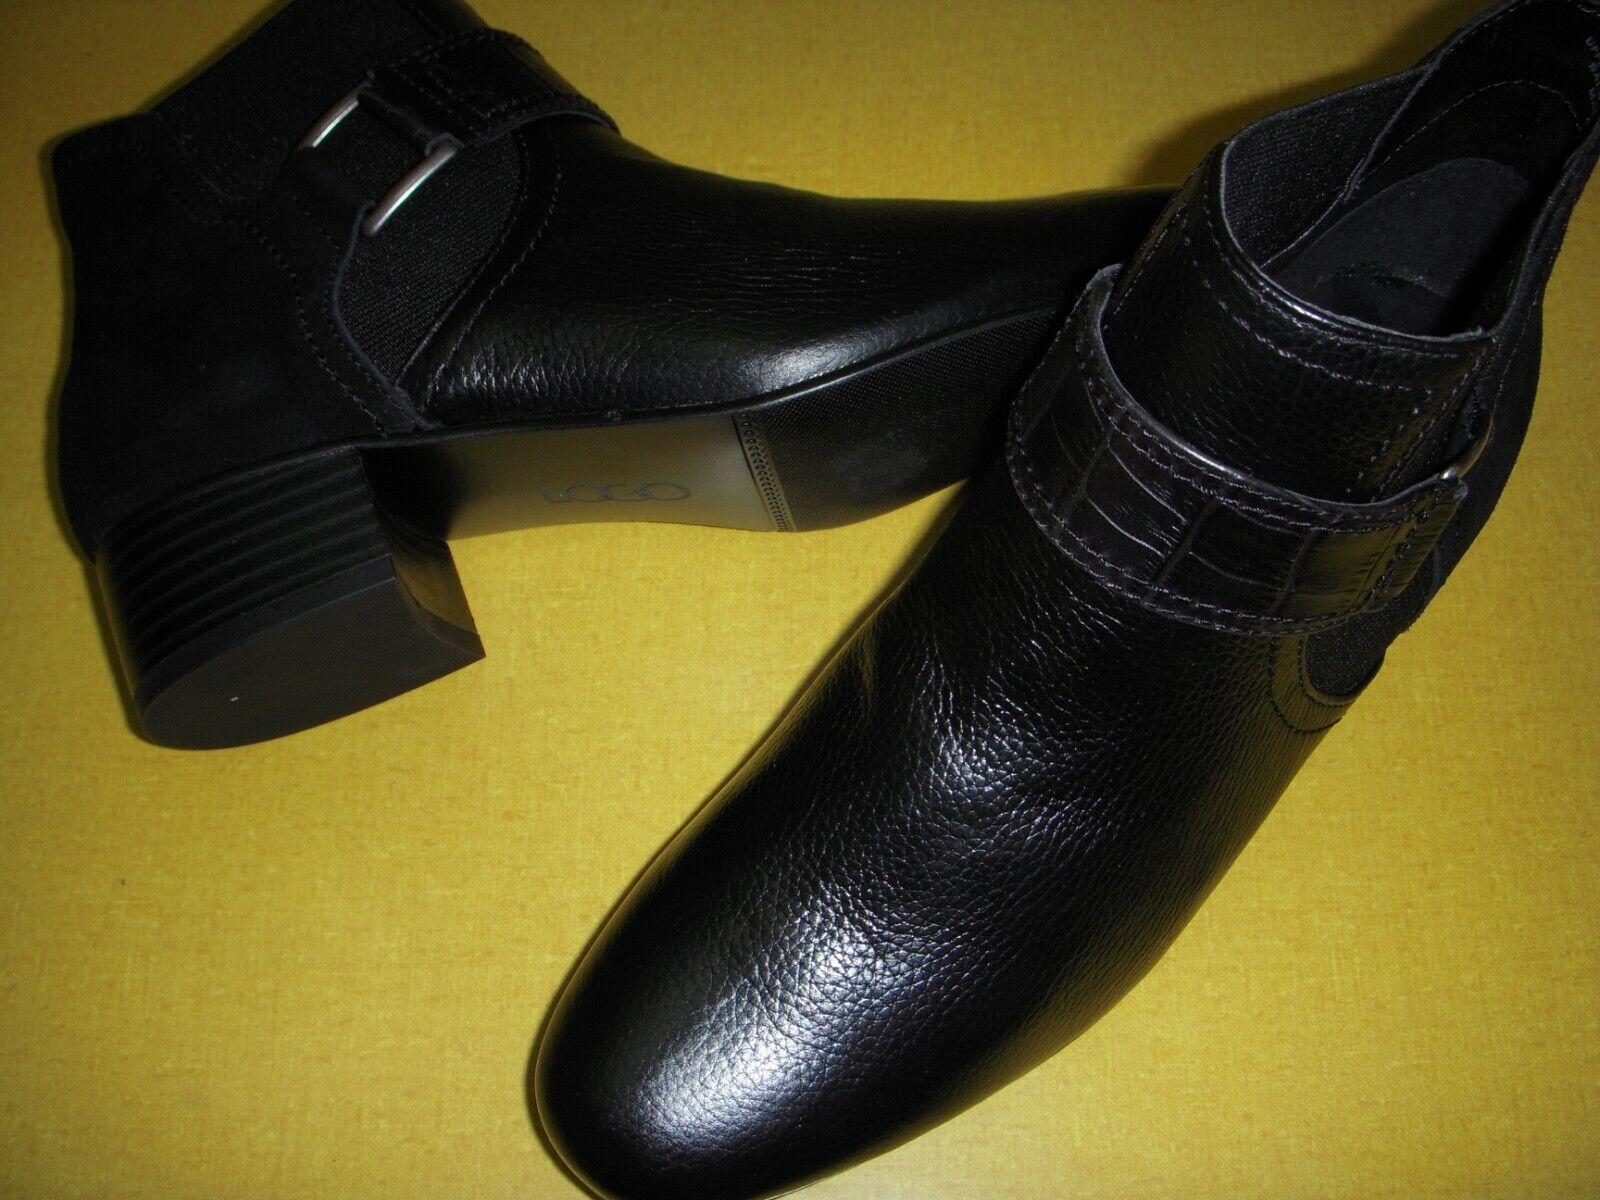 LOGO Lori Goldstein Sharon Leather Ankle Boots w/Strap Womens 7.5 M Black 7.5M ~